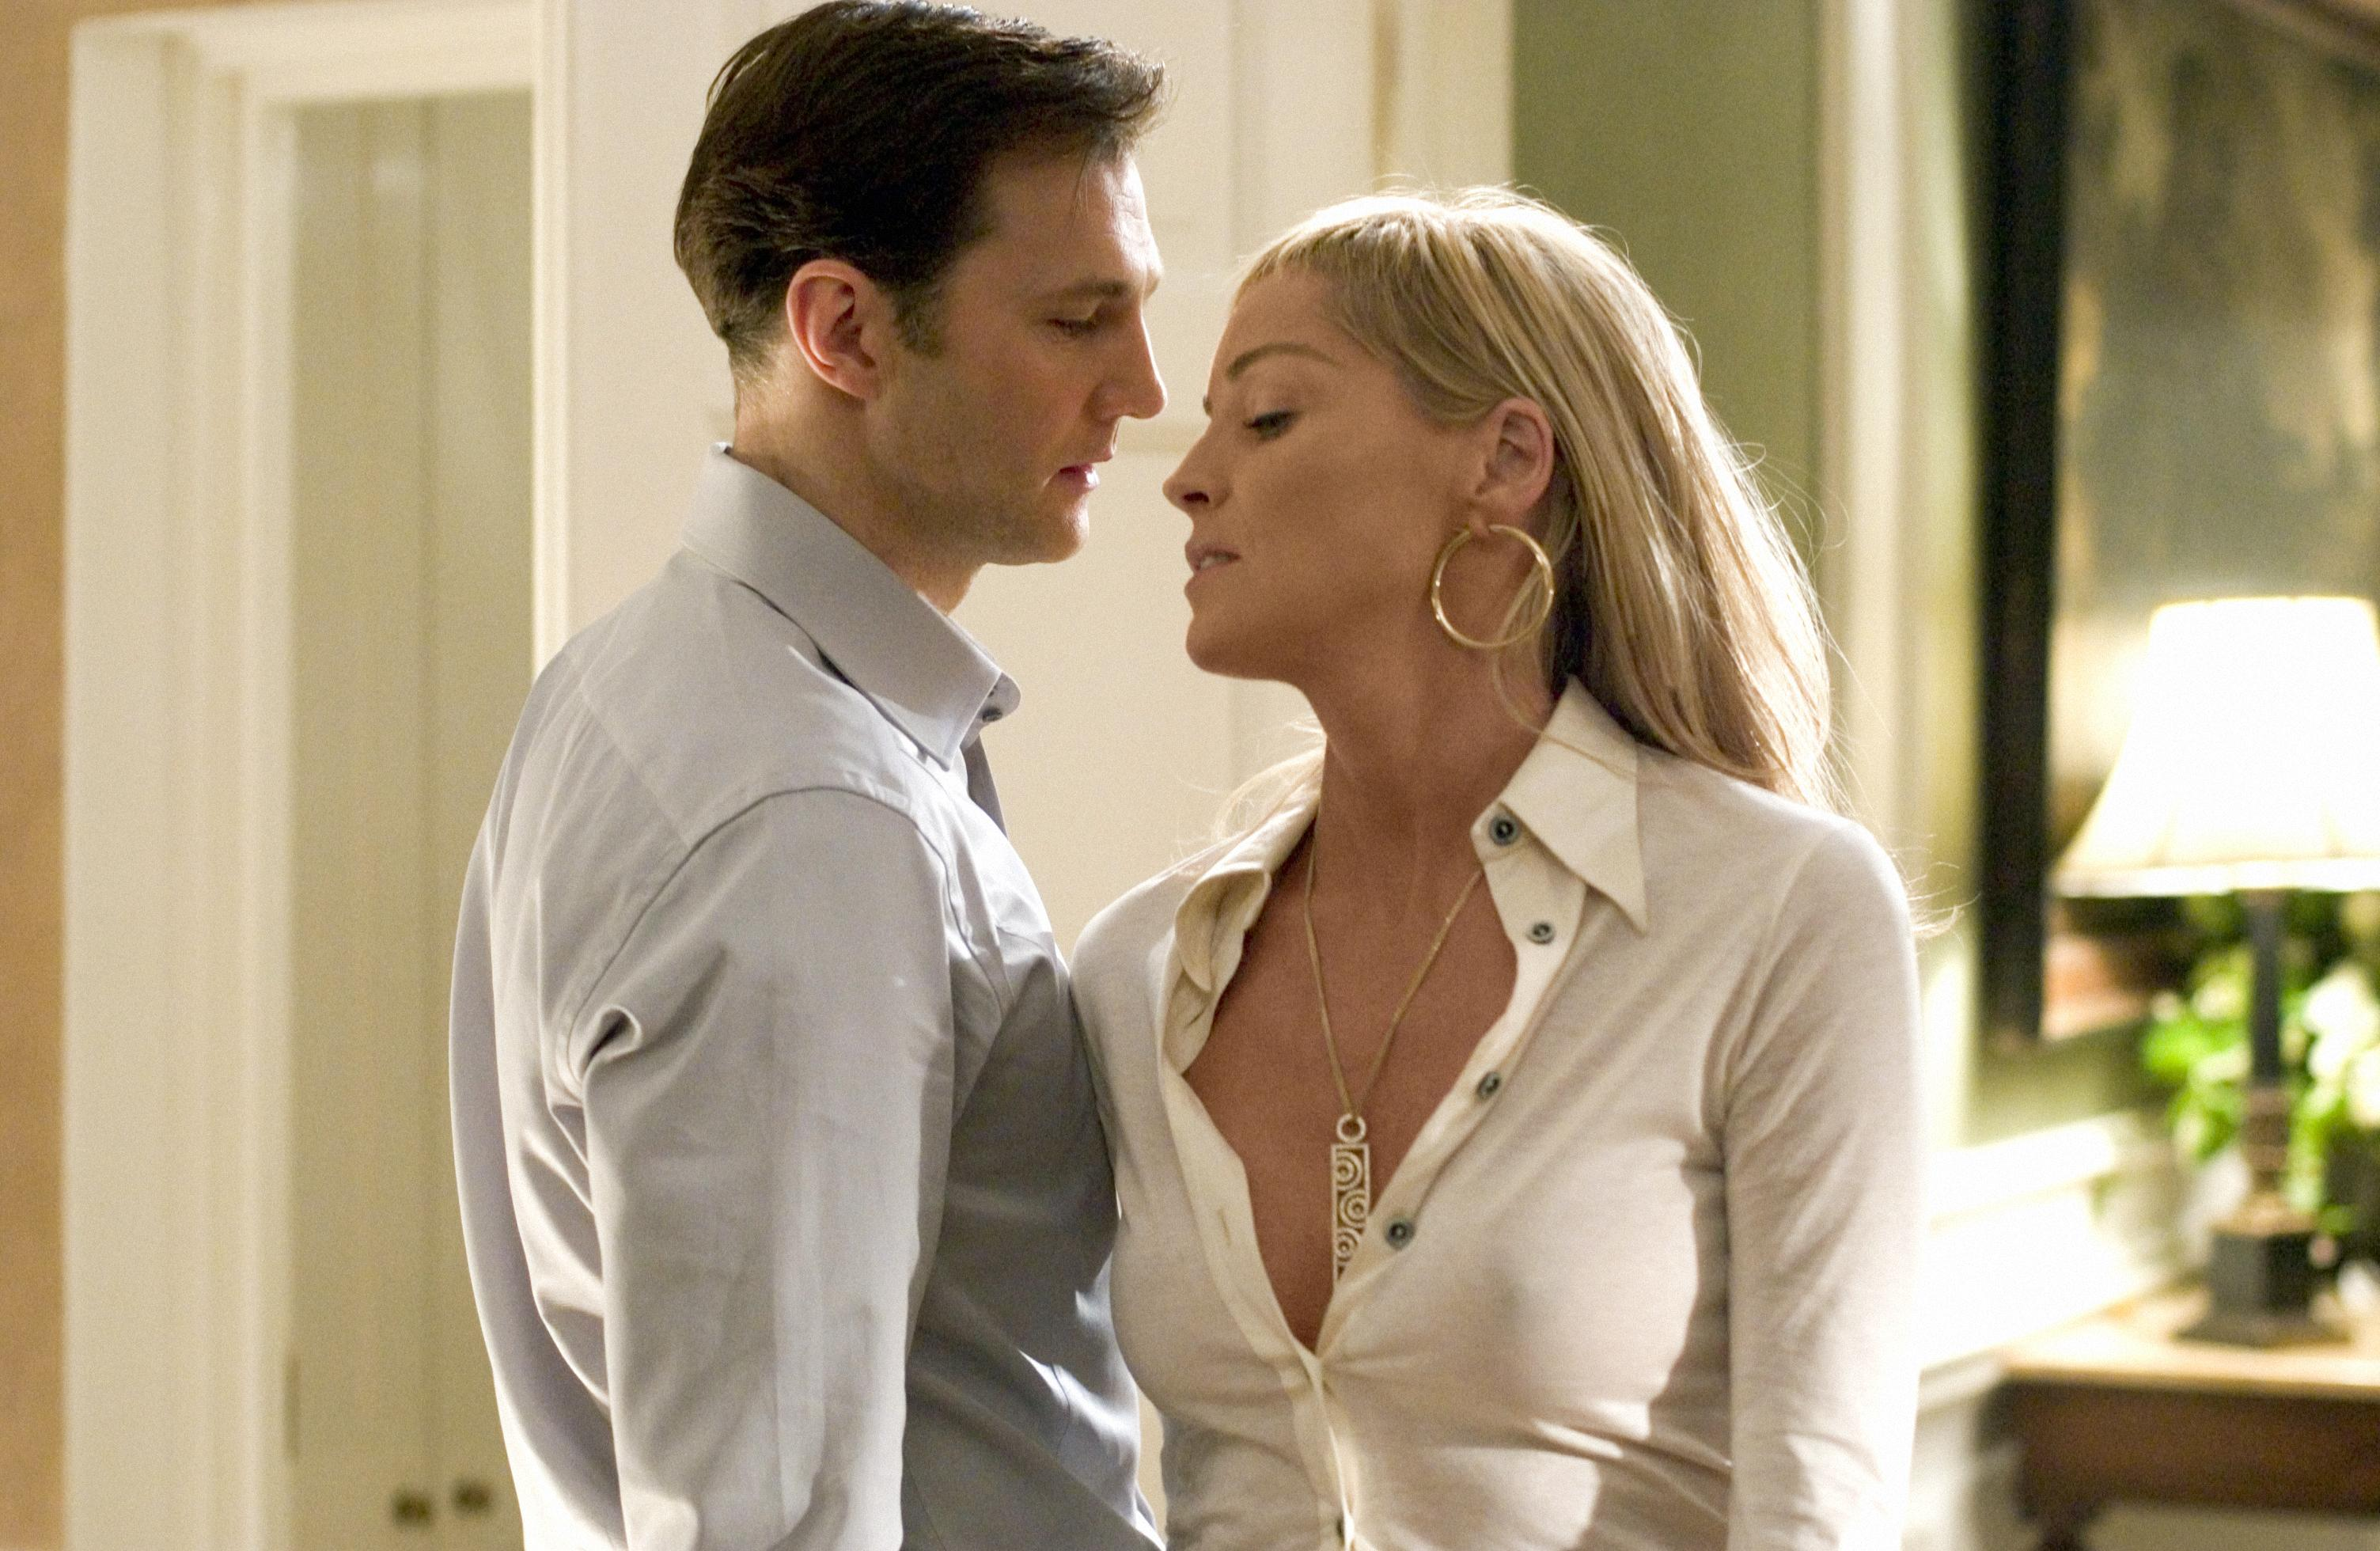 Sharon Stone seduces psychologist David Morrissey in Basic Instinct 2 (2006)